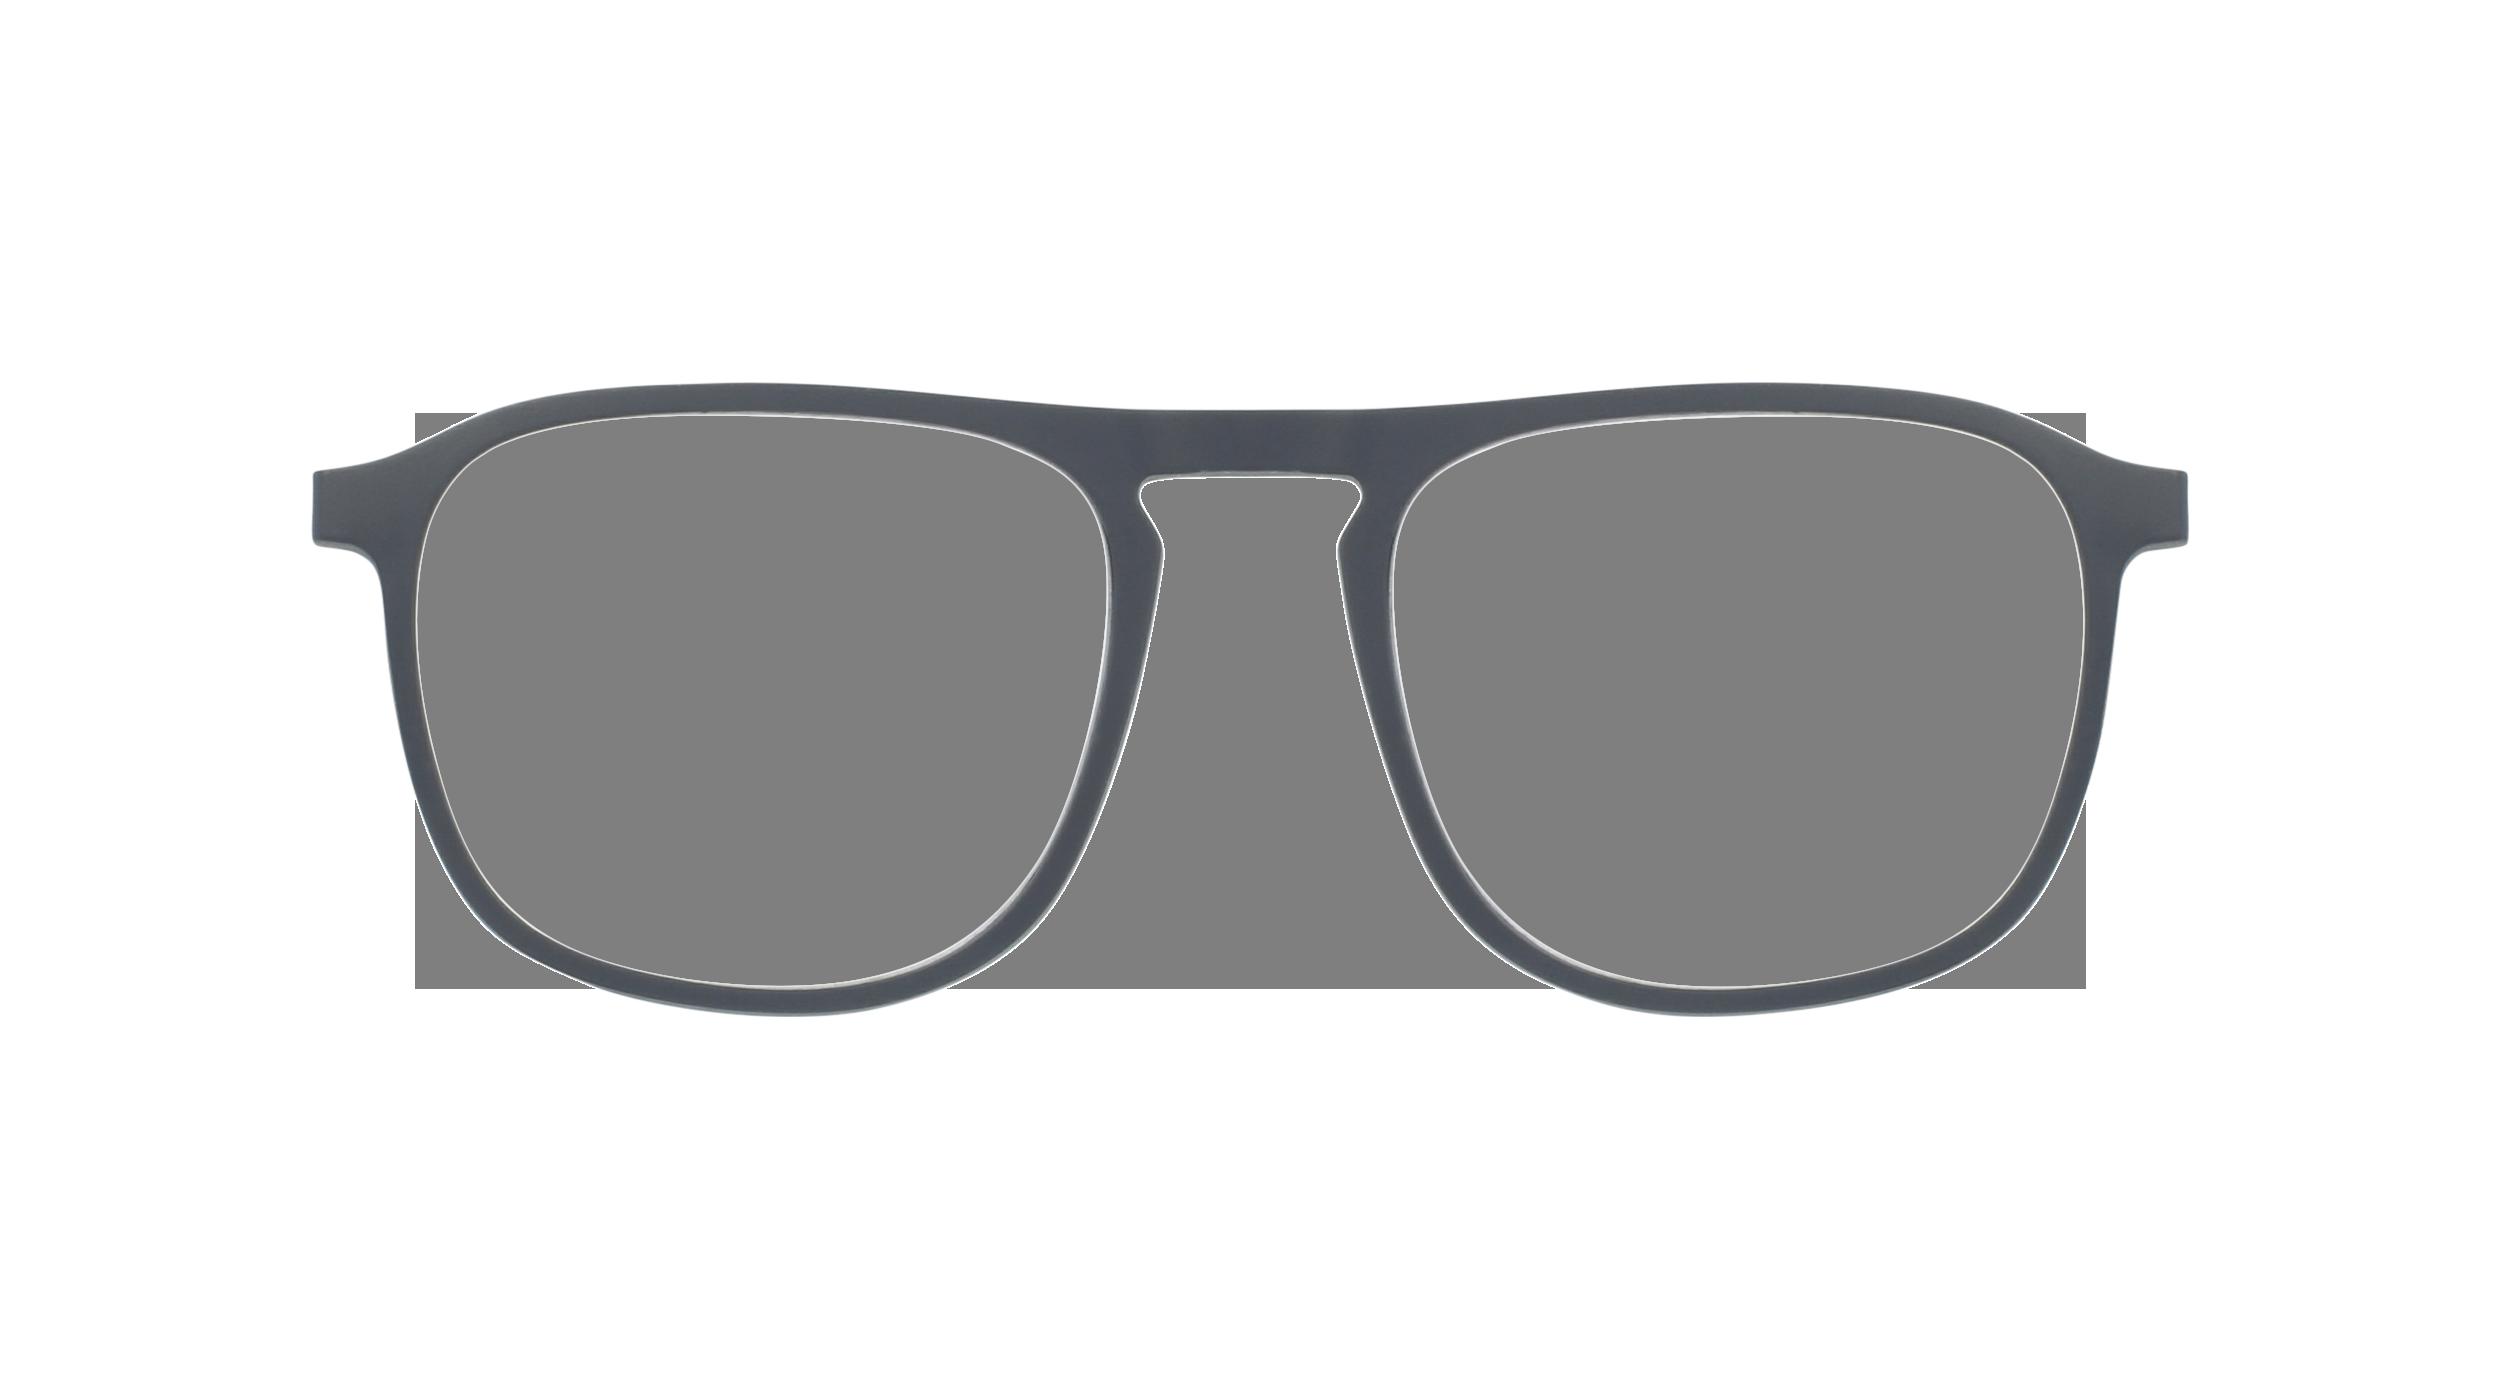 afflelou/france/products/smart_clip/clips_glasses/07630036457283.png